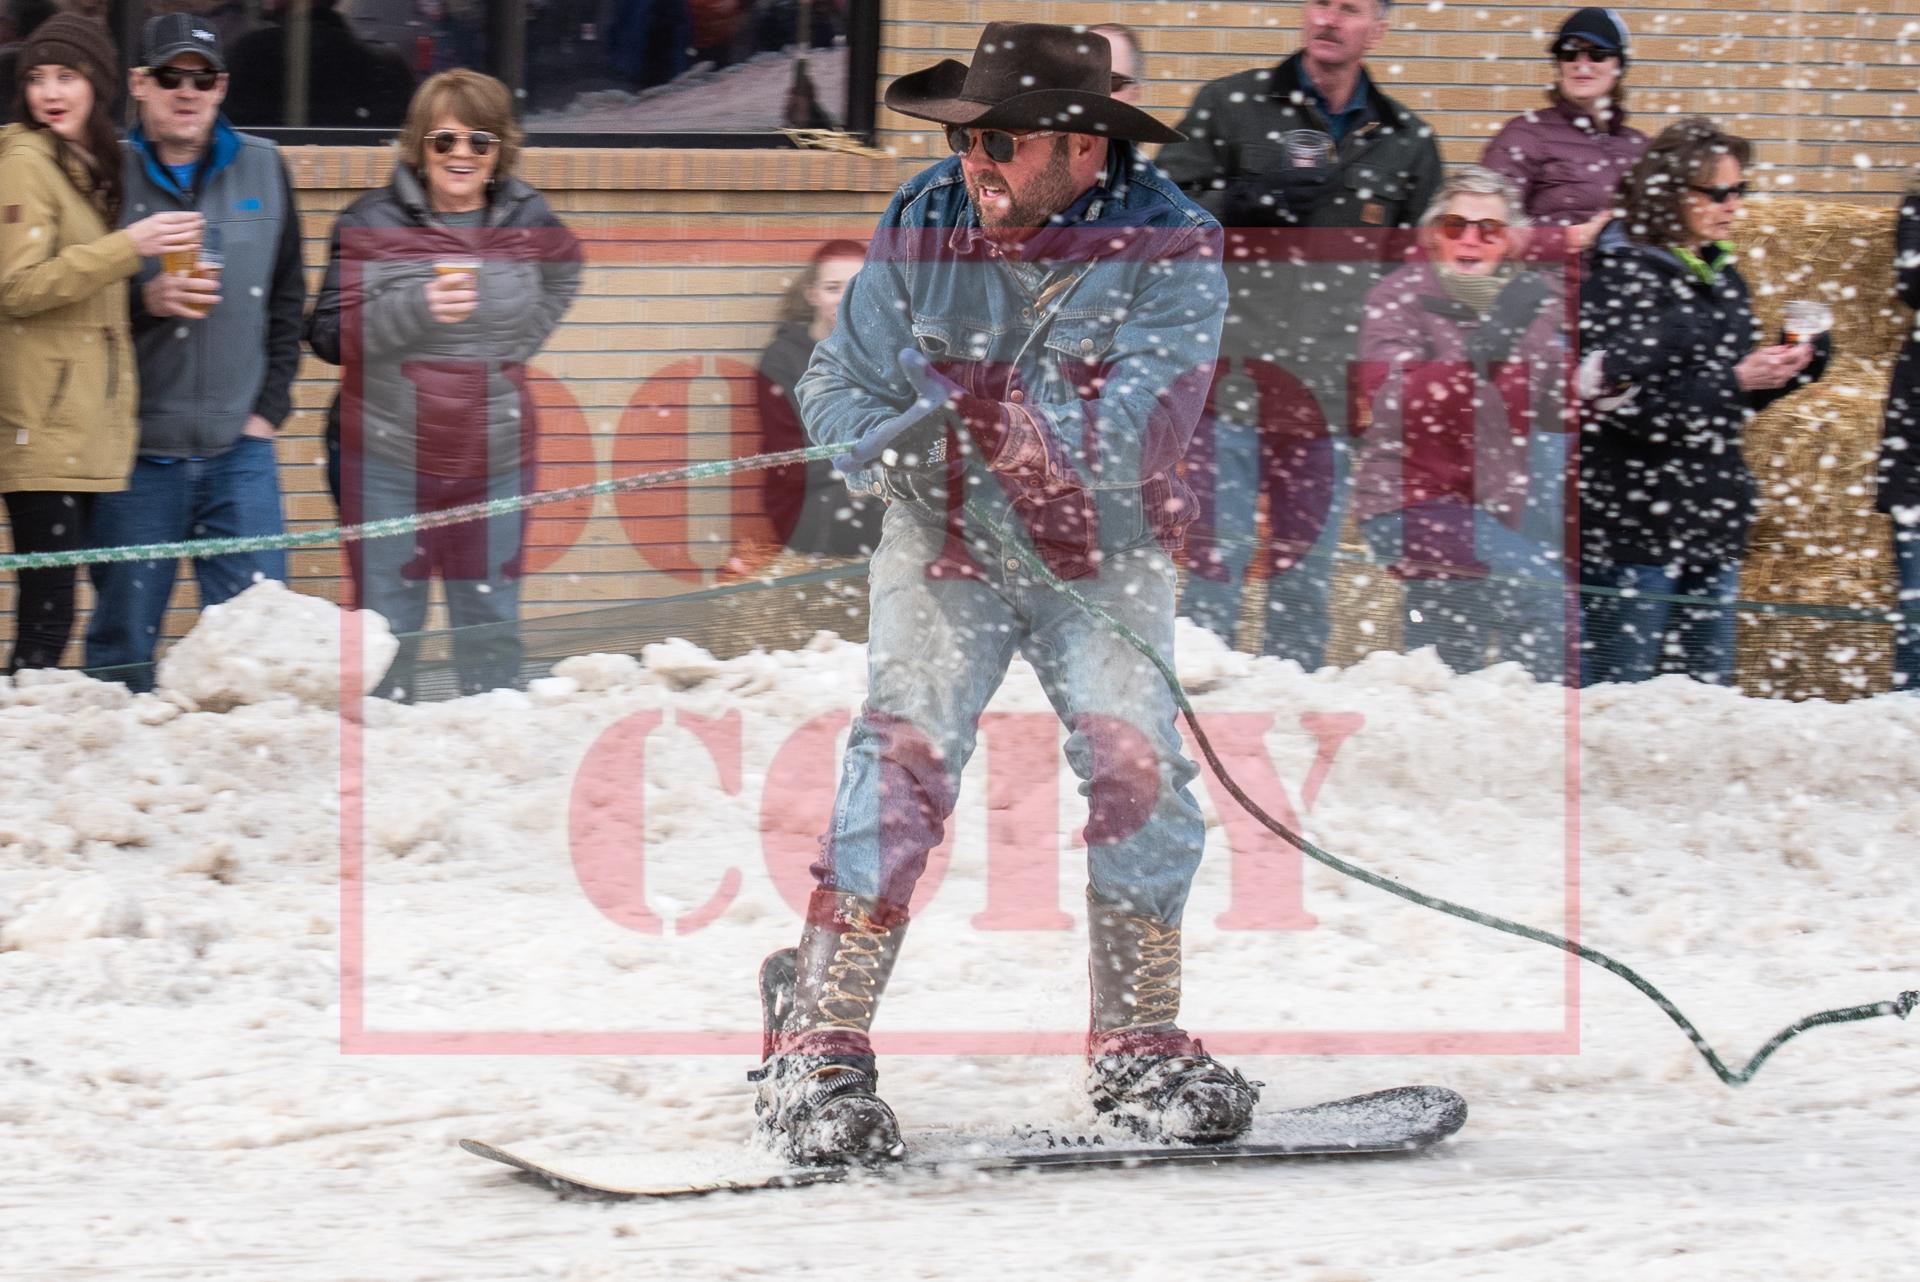 - Melissa Ostrander - Snowboard 6